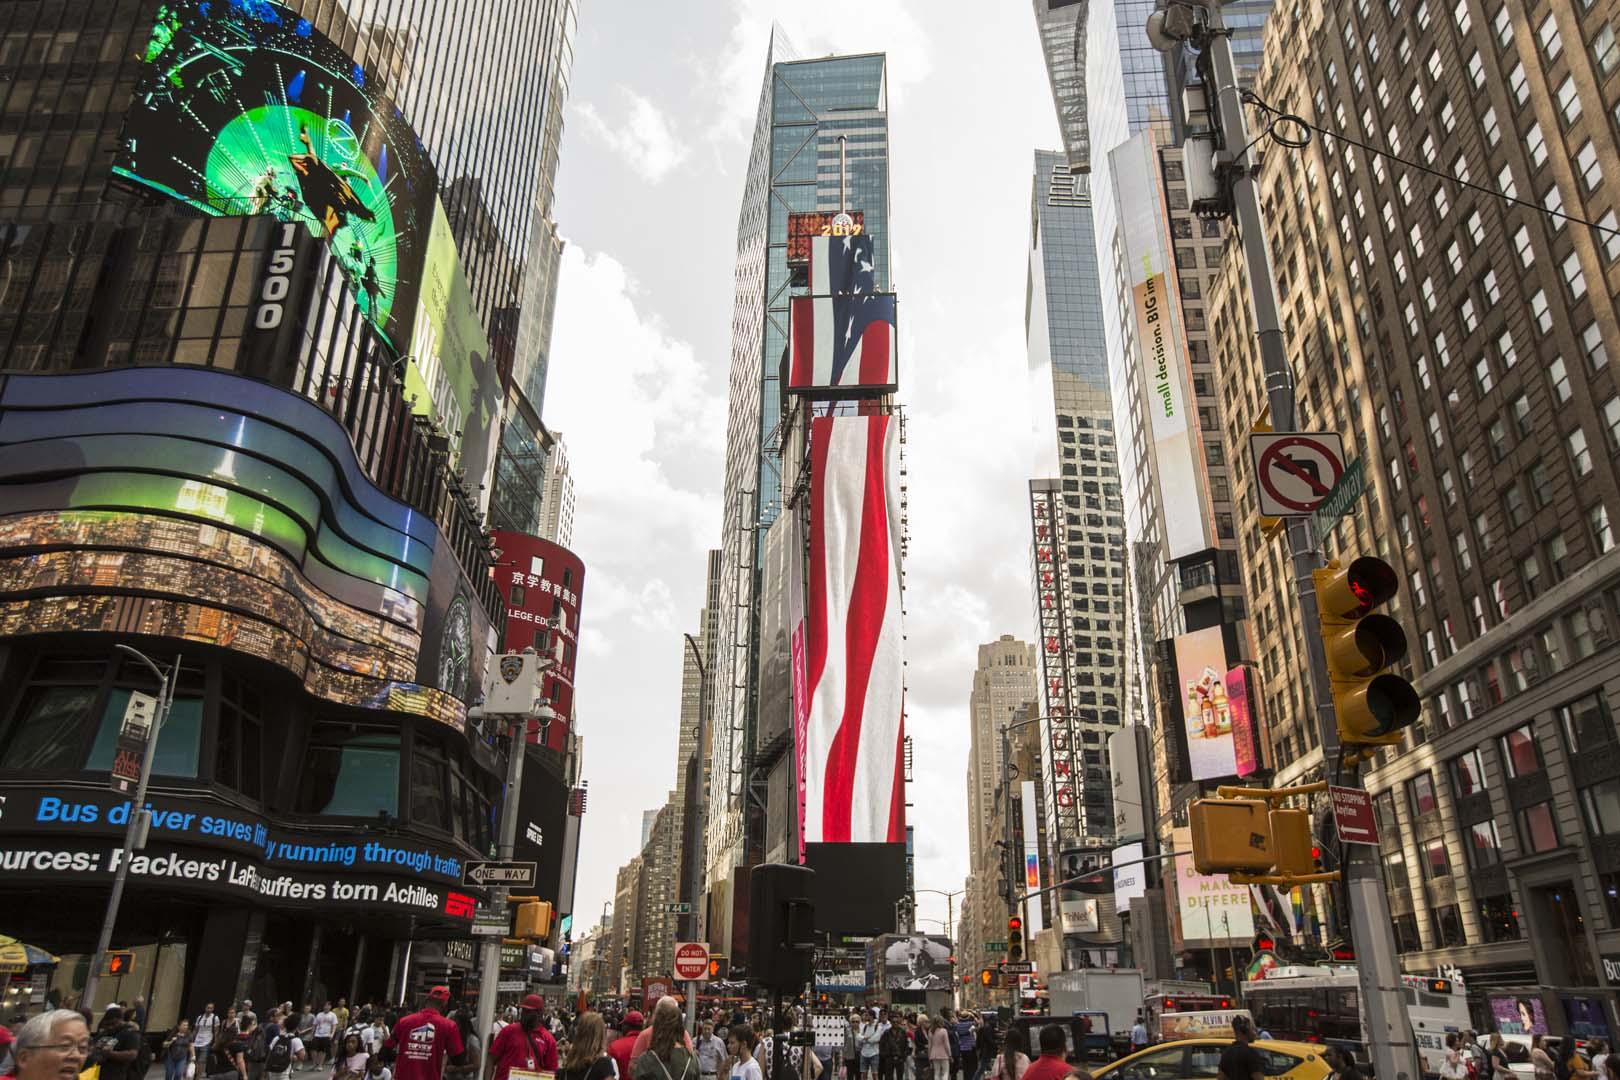 One Times Square Digital Art